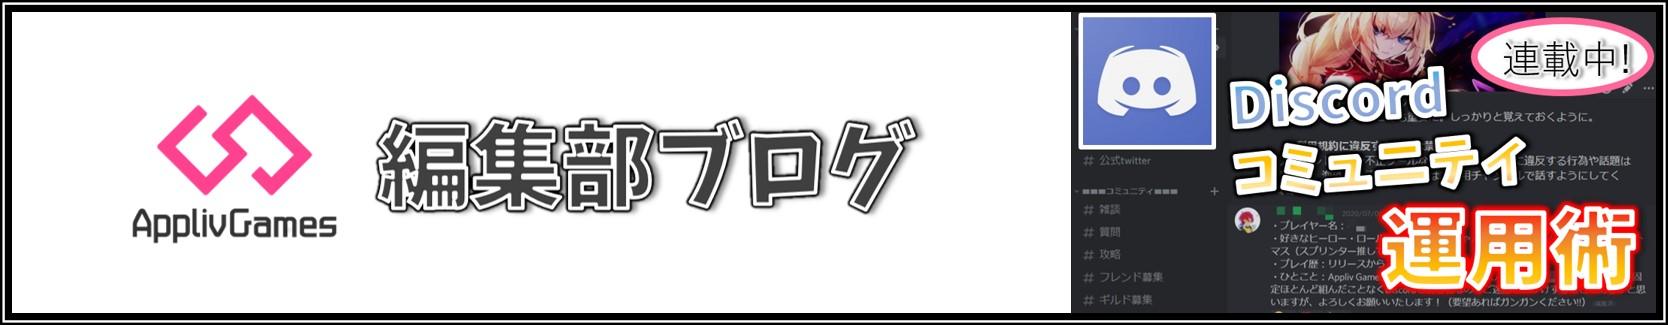 Appliv Games編集部ブログ